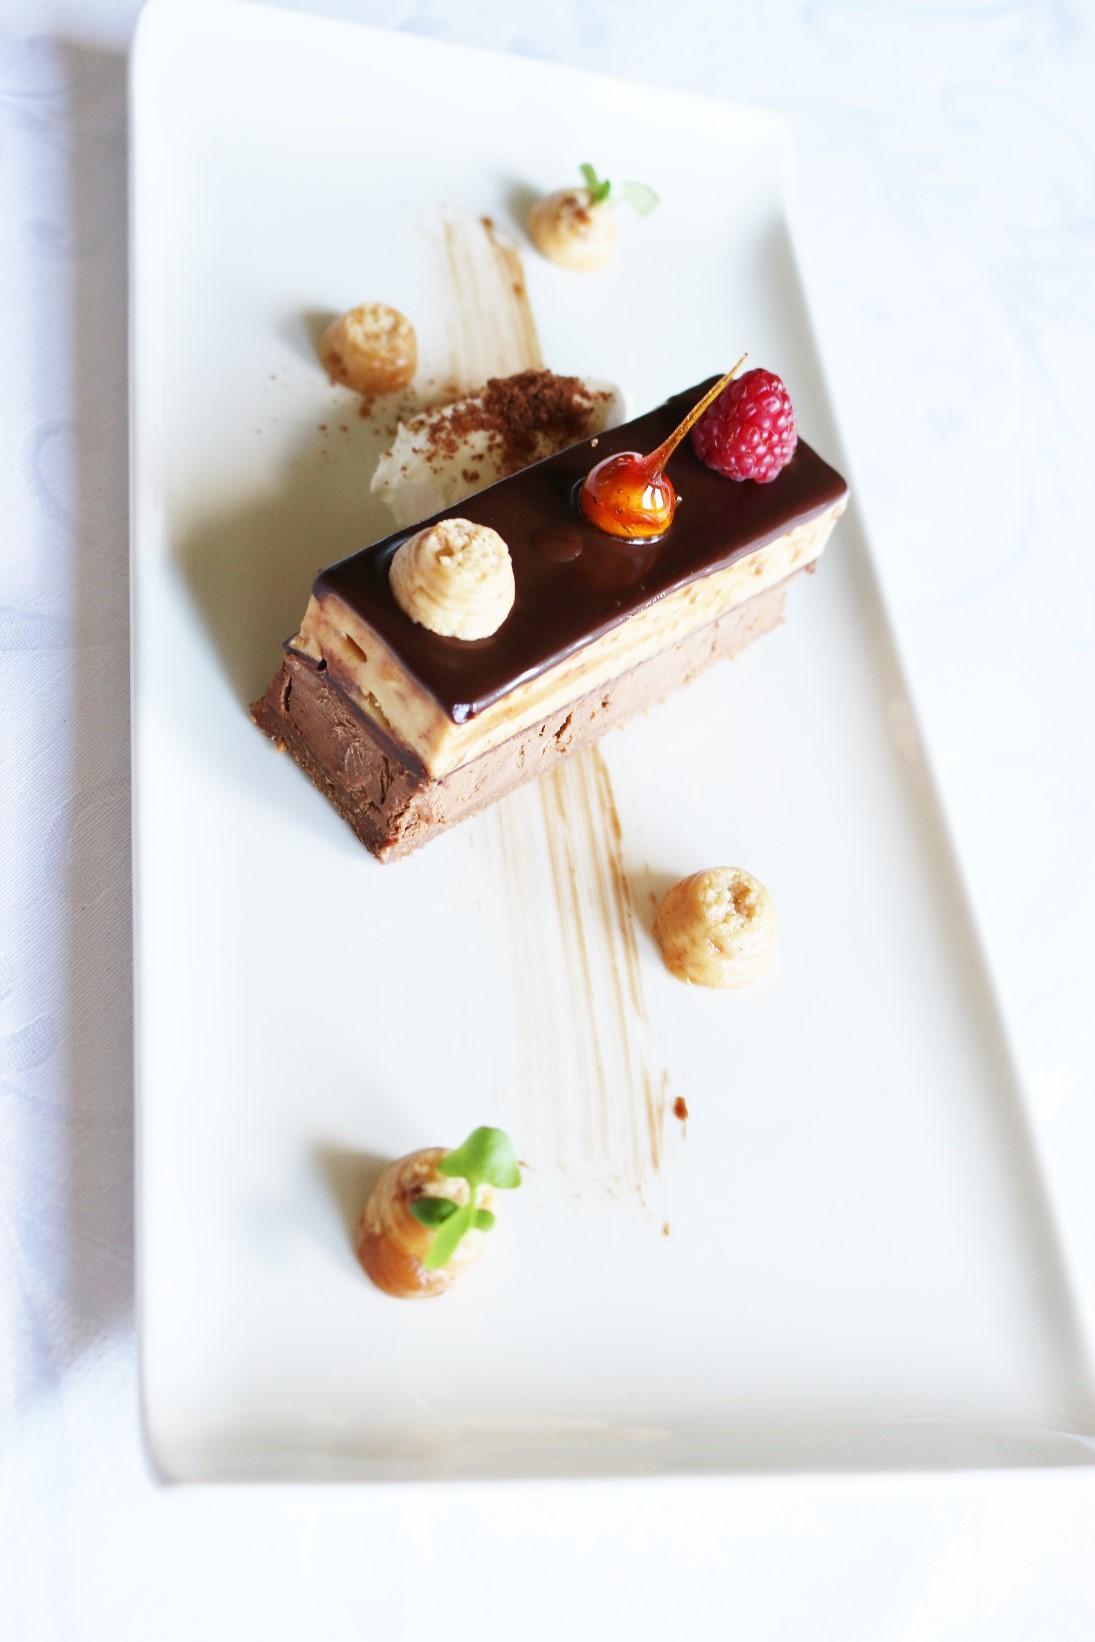 Halaszbastya Restaurant choocolate dessert with hazlenuts